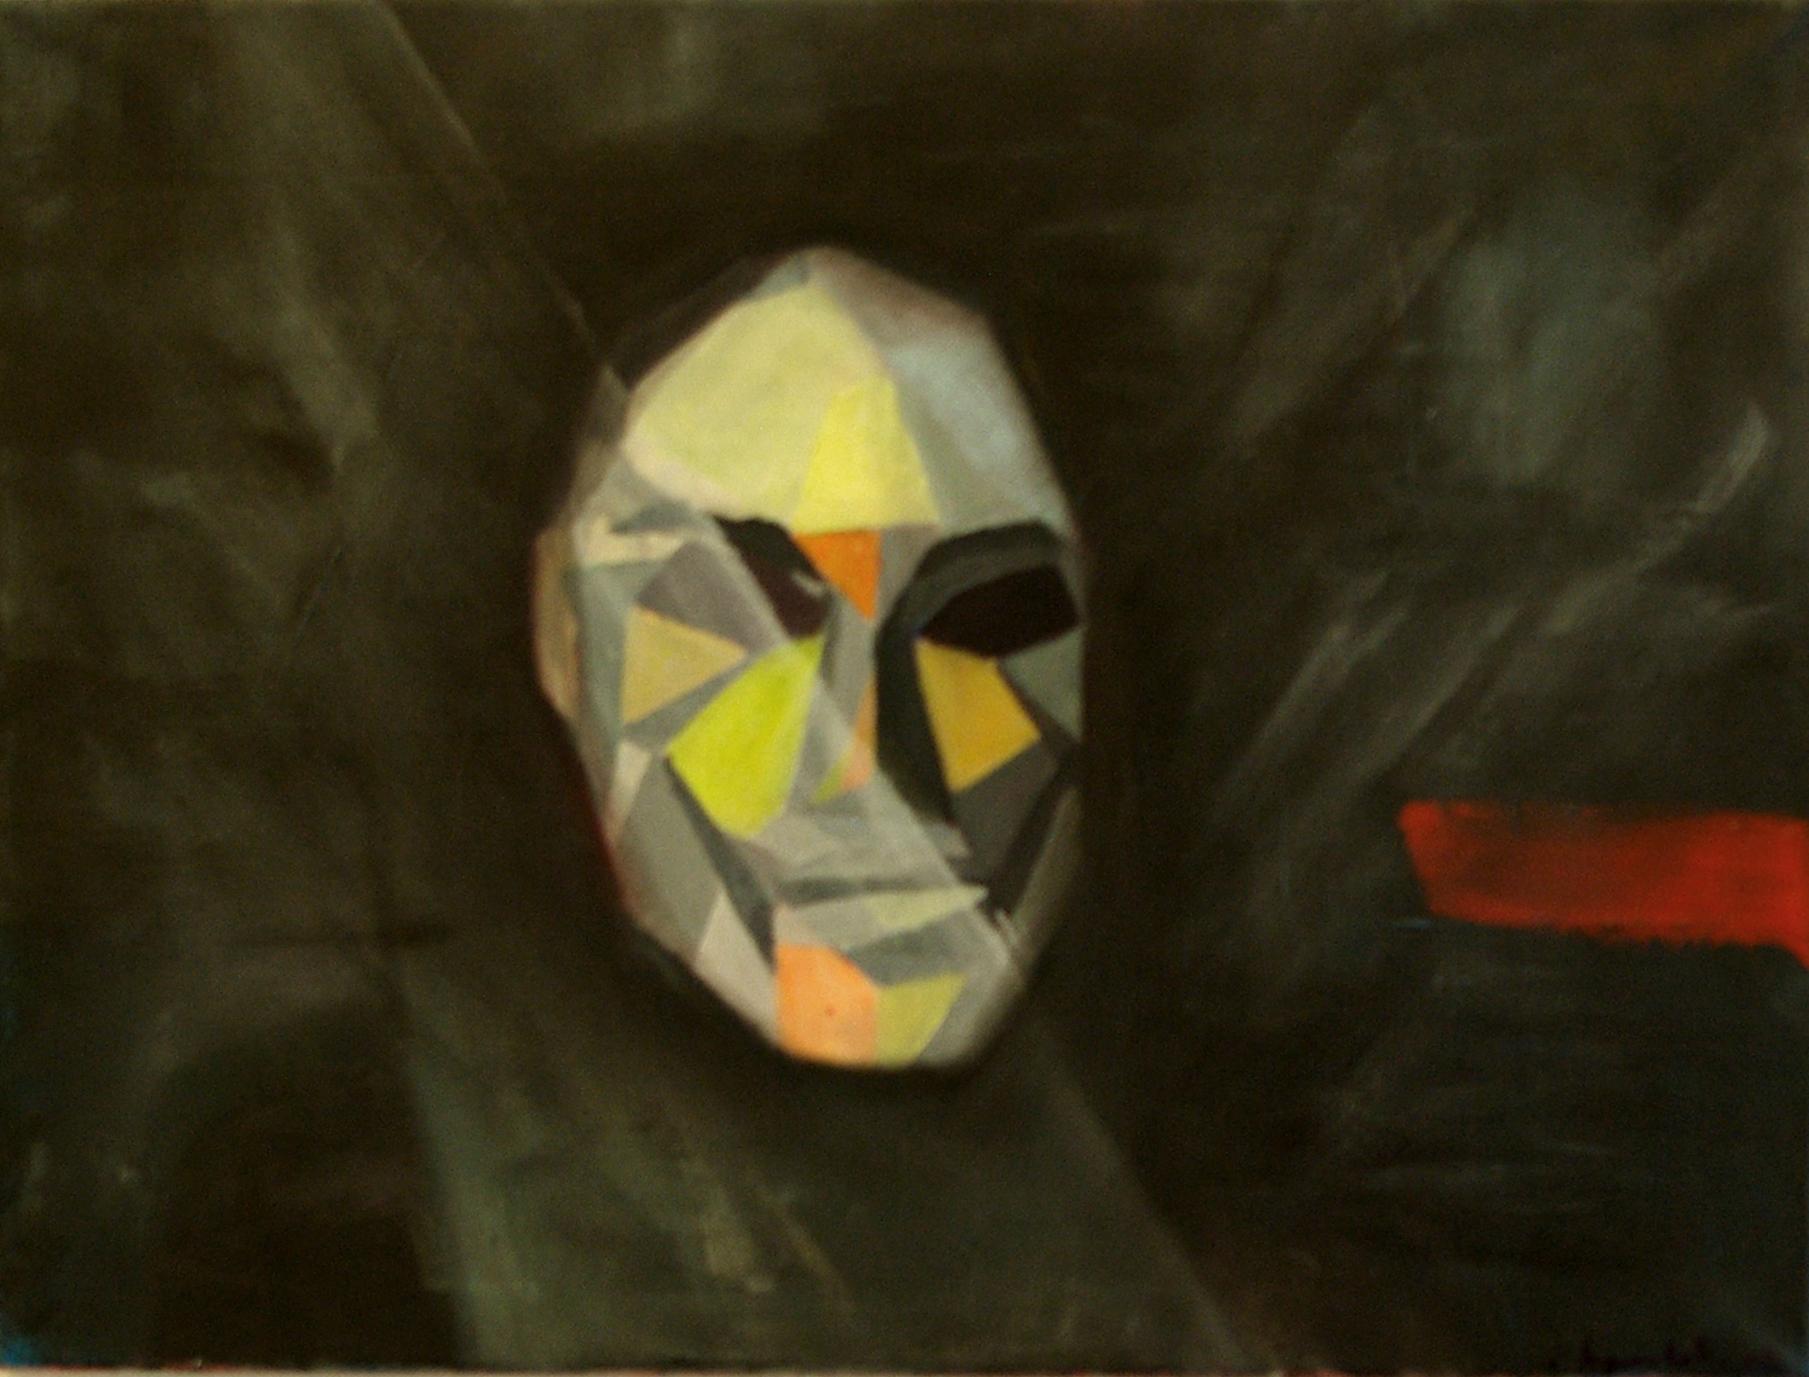 mask - alterego